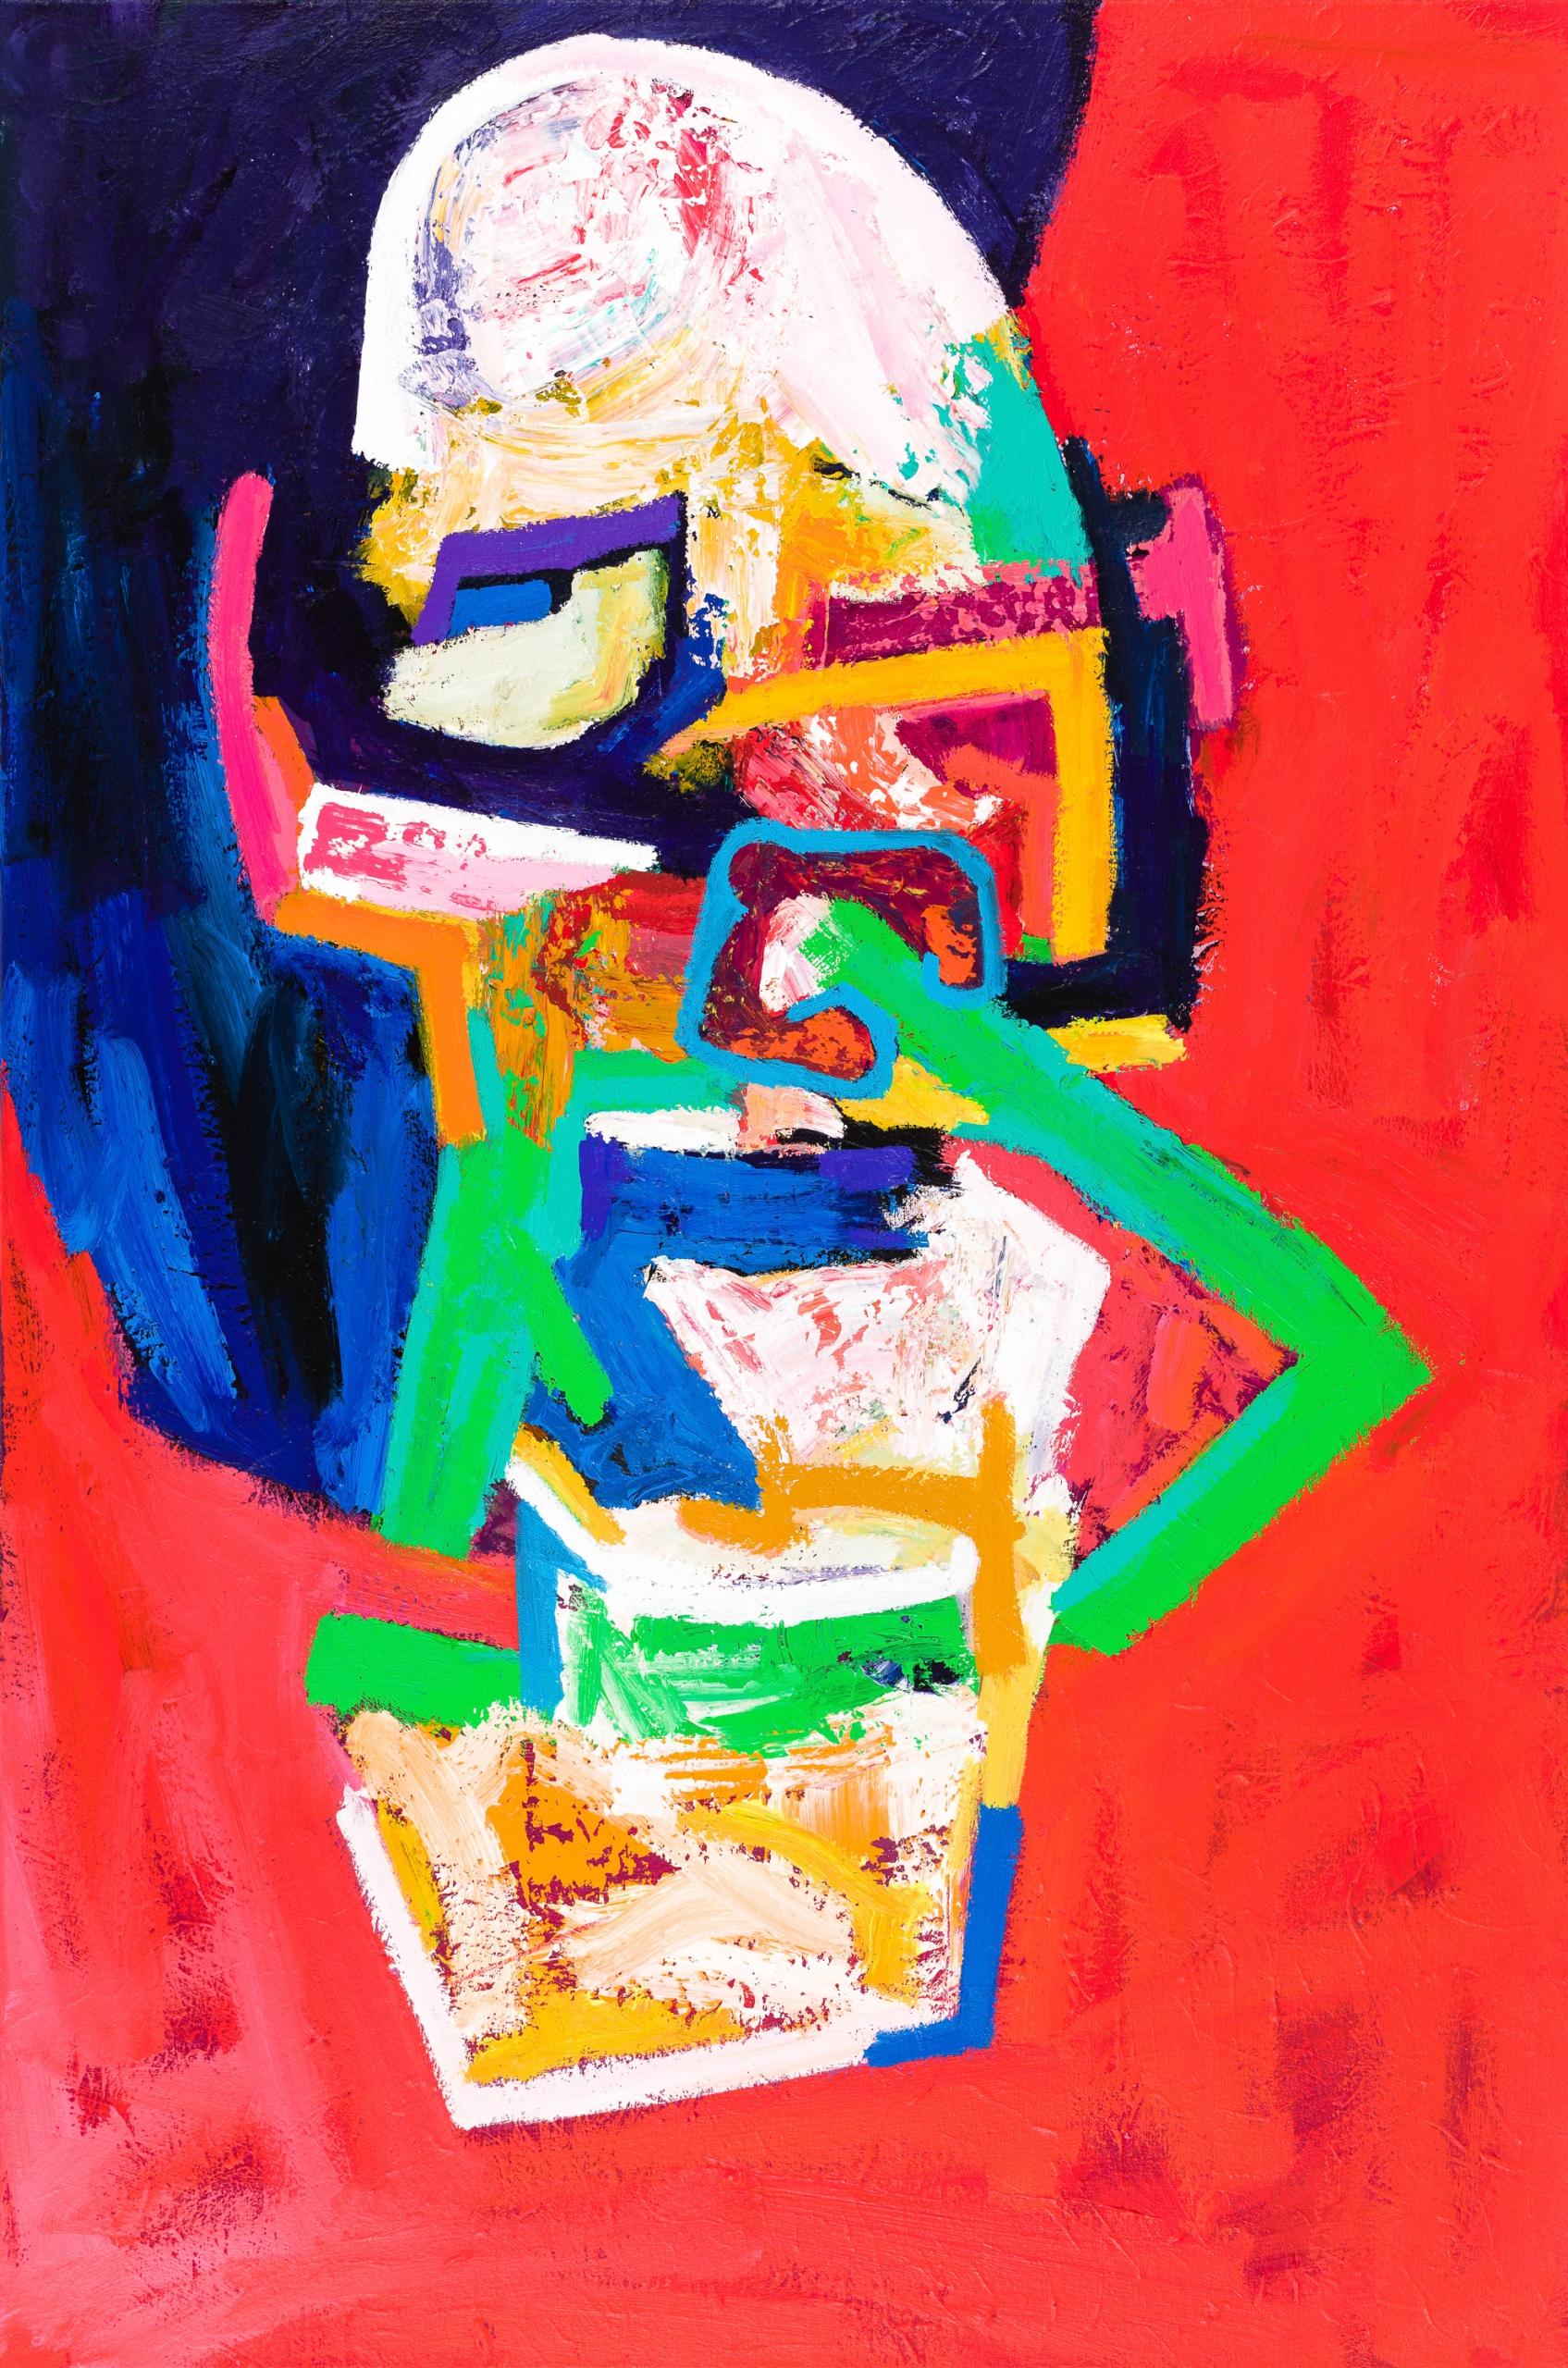 Alexander Waltner, Ohne Titel / untitled